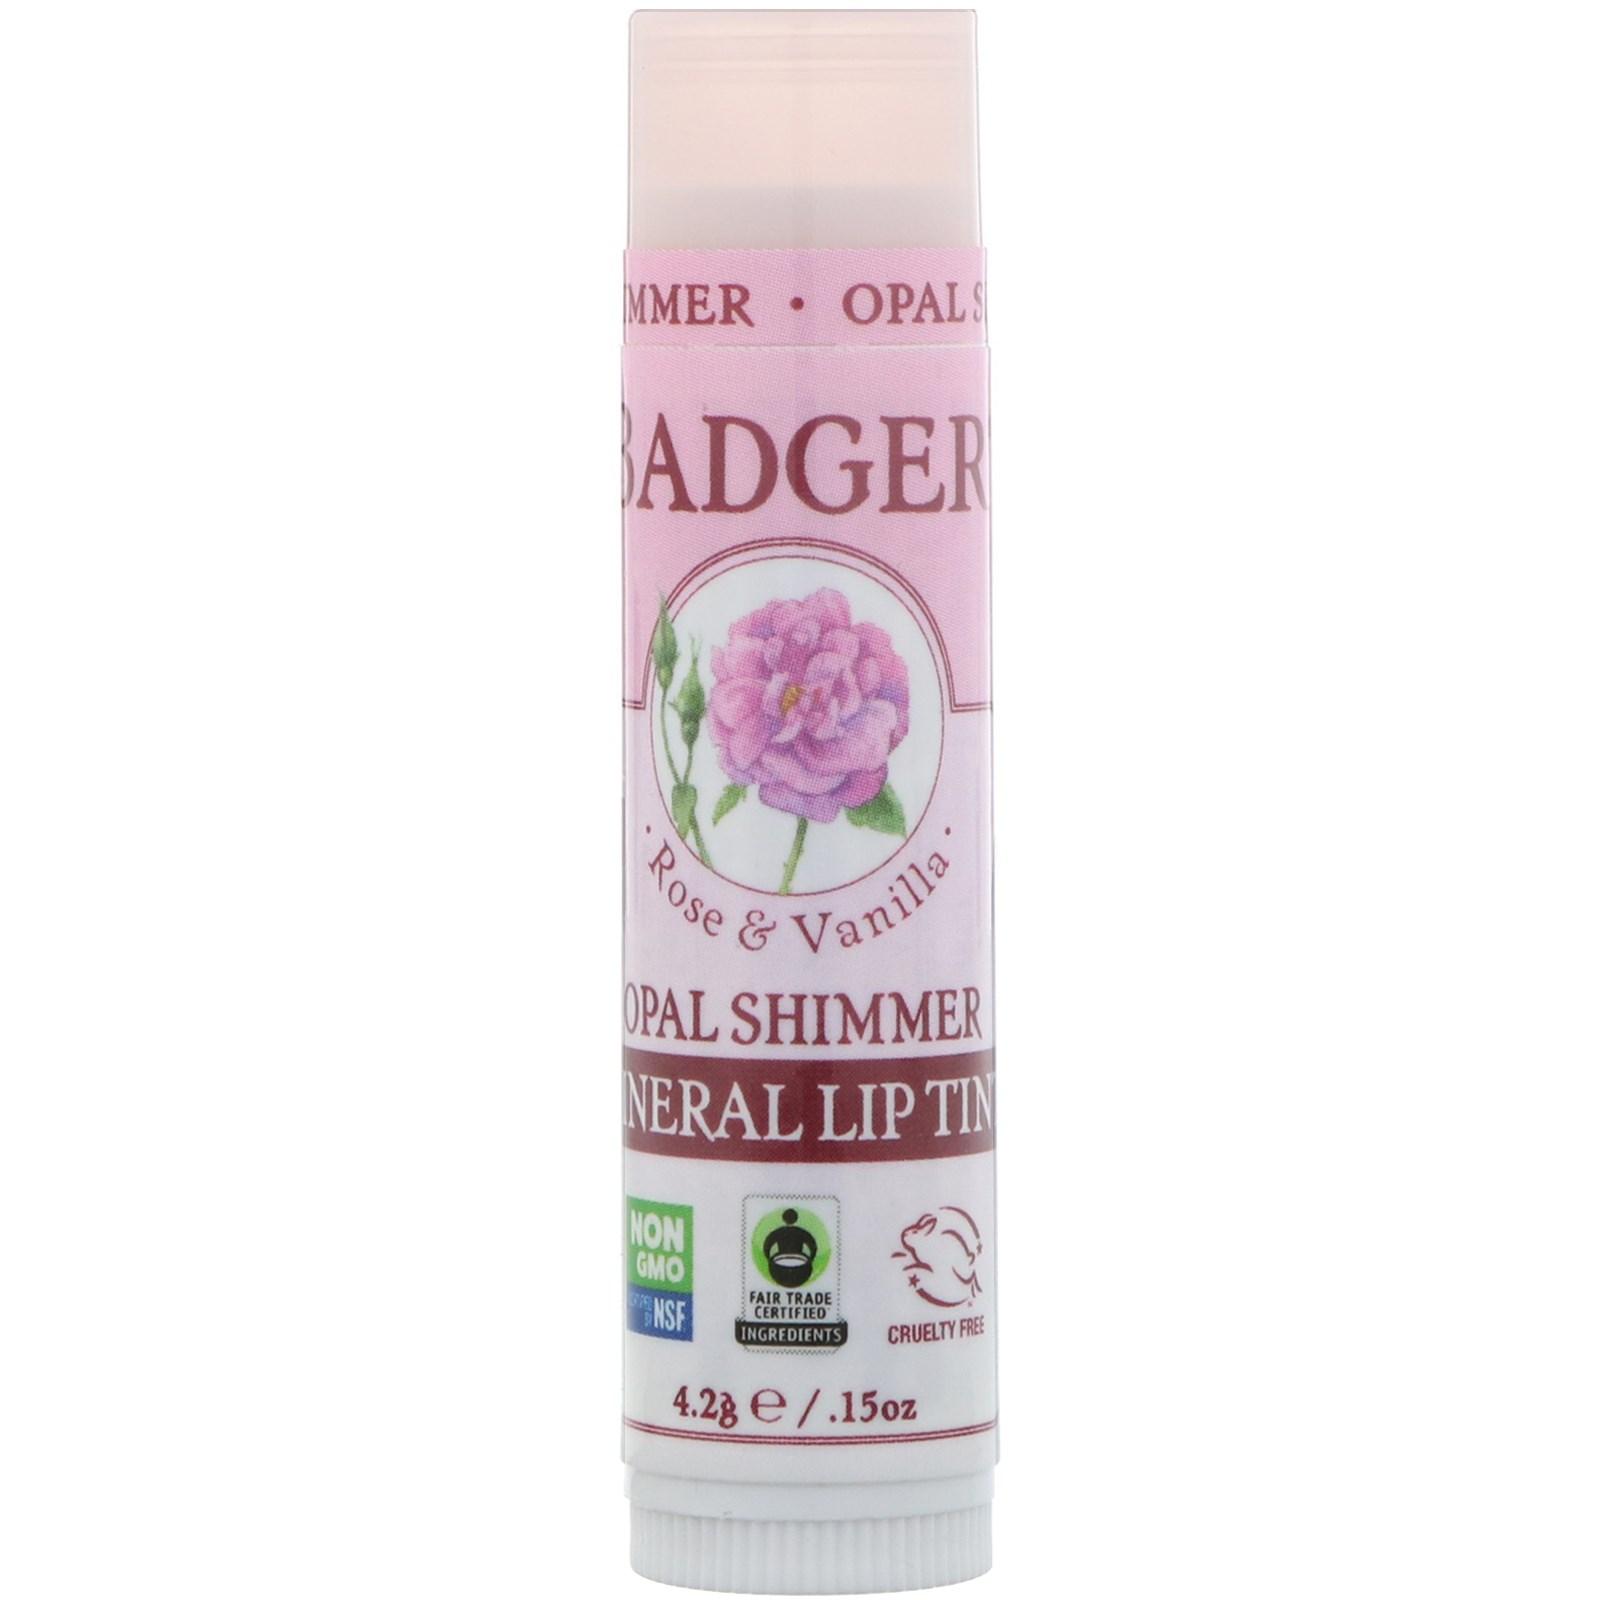 Badger Company, Mineral Lip Tint, Opal Shimmer, .15 oz (4.2 g)